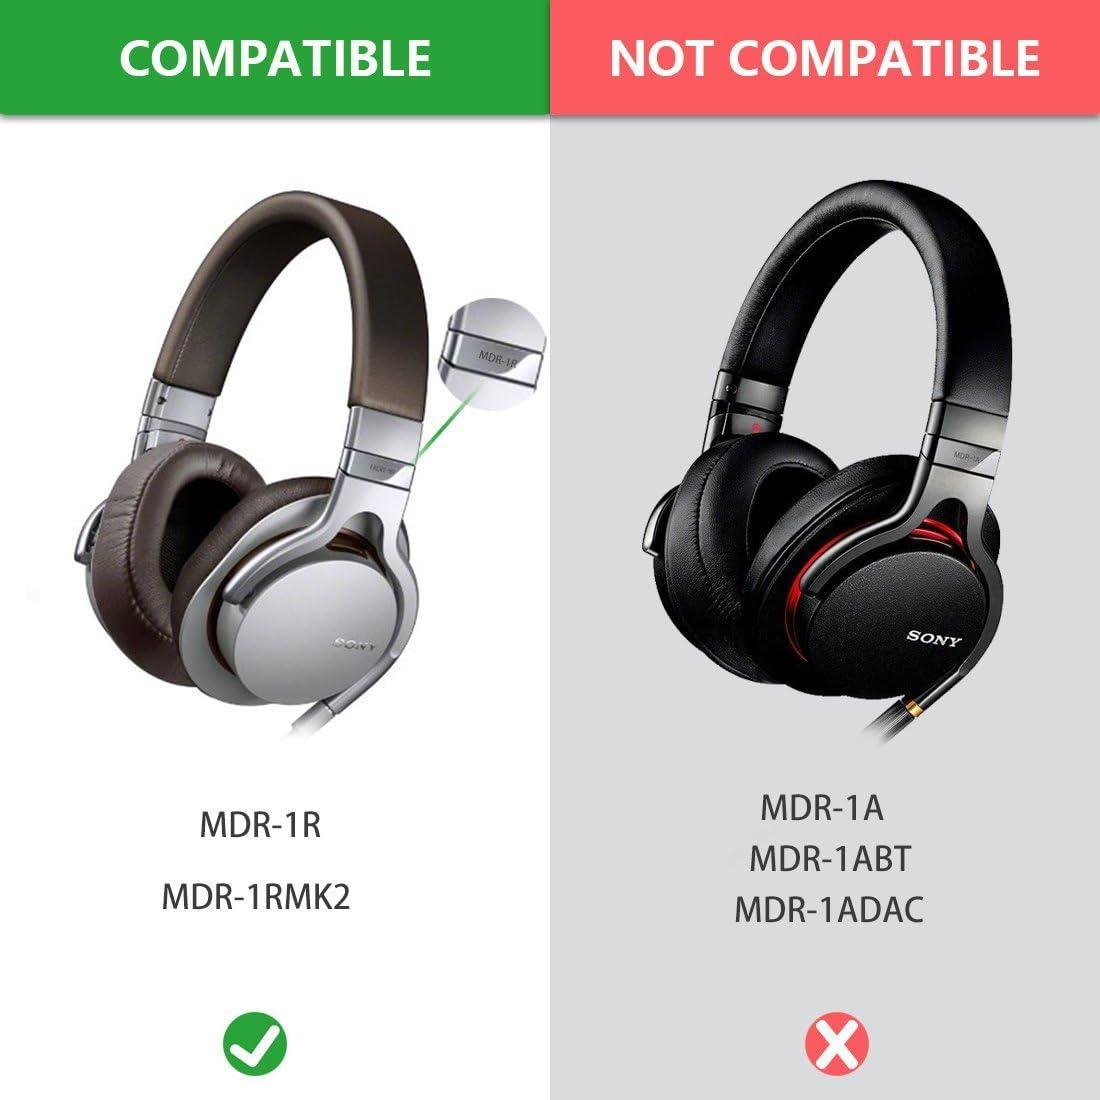 Coffee//Brown Geekria Earpad for Sony MDR-1R MDR-1RMK2 Headphone Ear Pad//Ear Cushion//Ear Cups//Ear Cover//Earpads Repair Parts